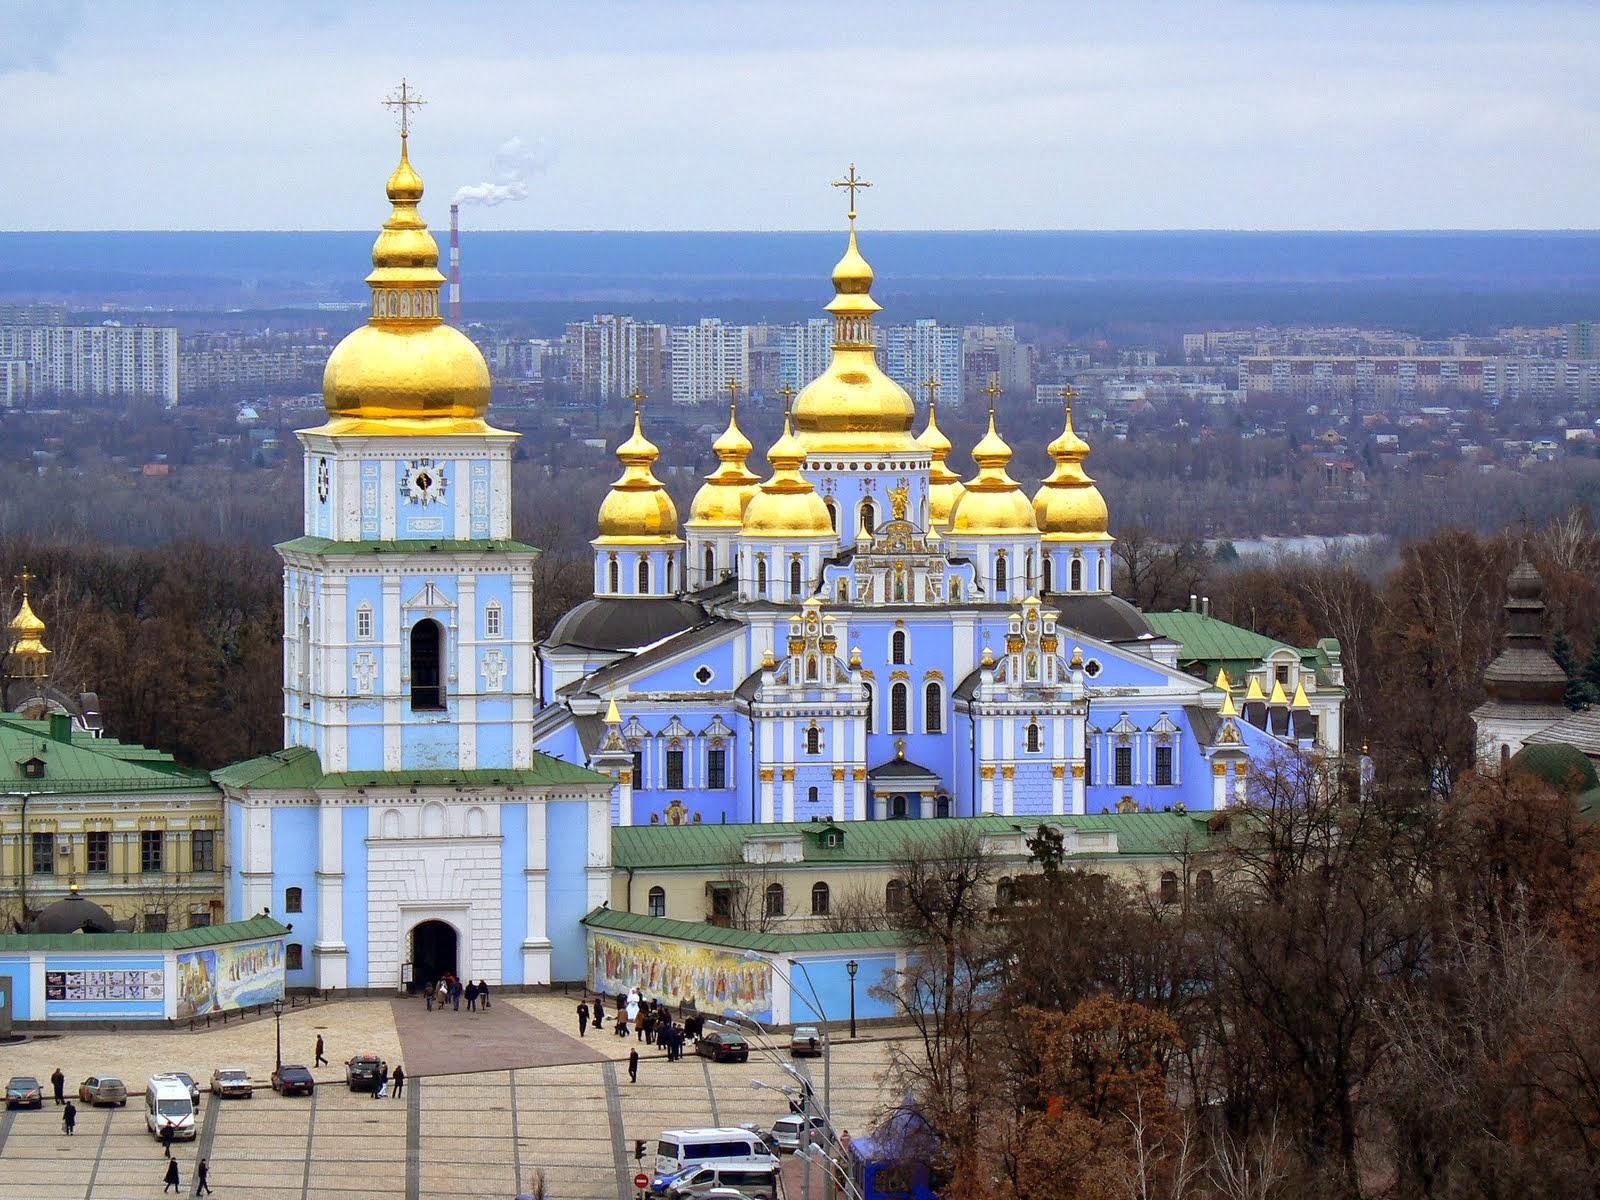 Agencia en Kiev Ucrania completa